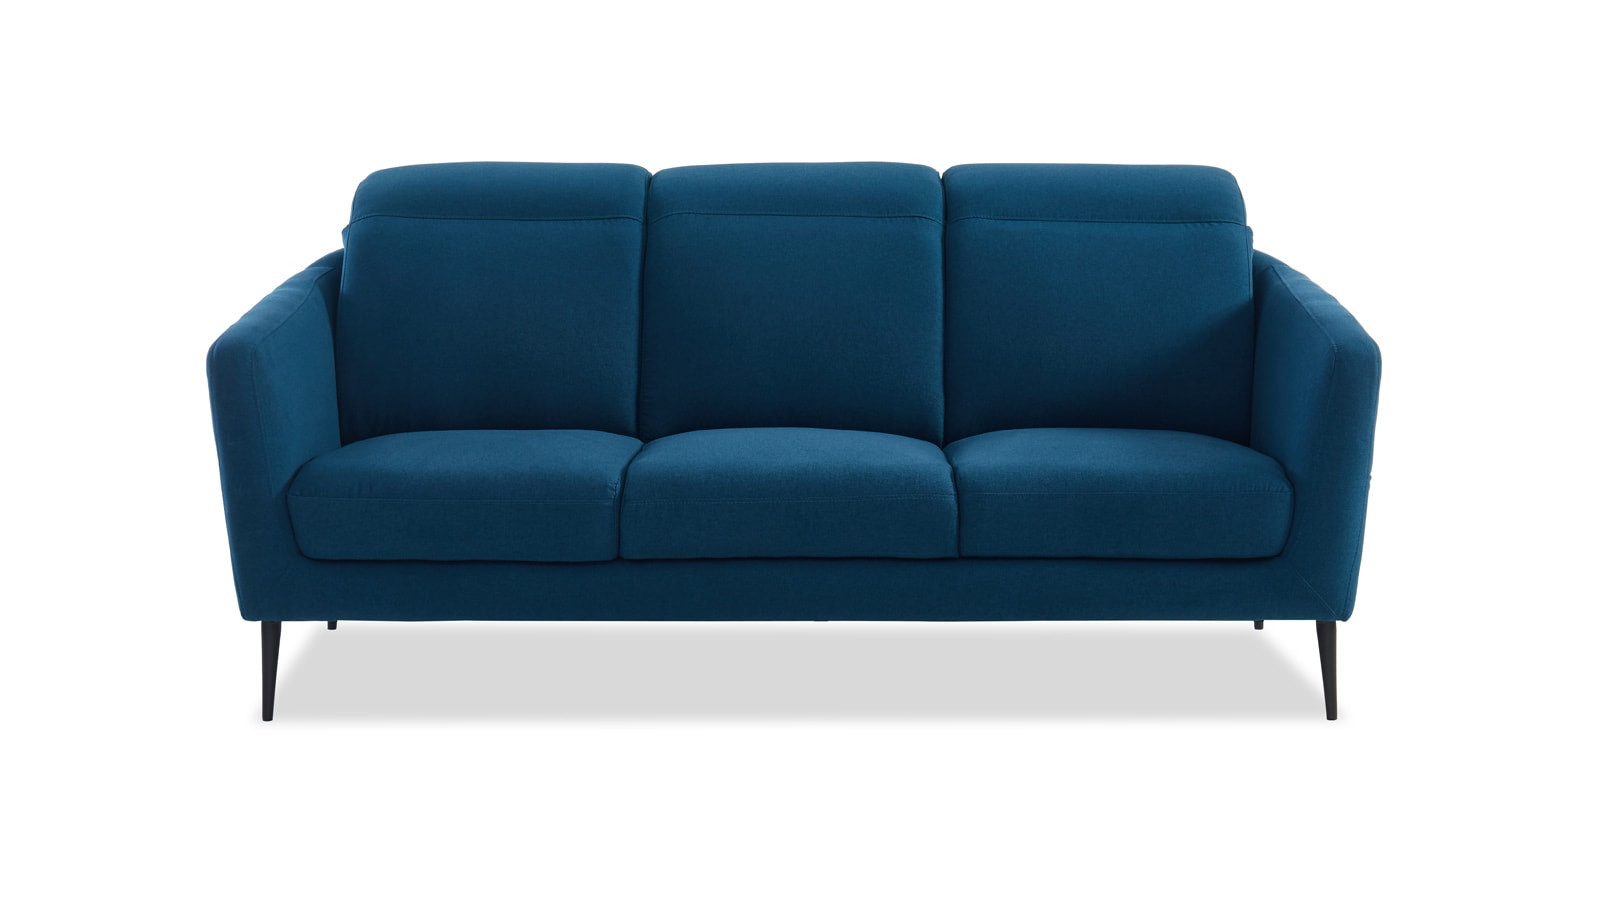 Canapé 3 places en tissu bleu canard piètement en métal noir